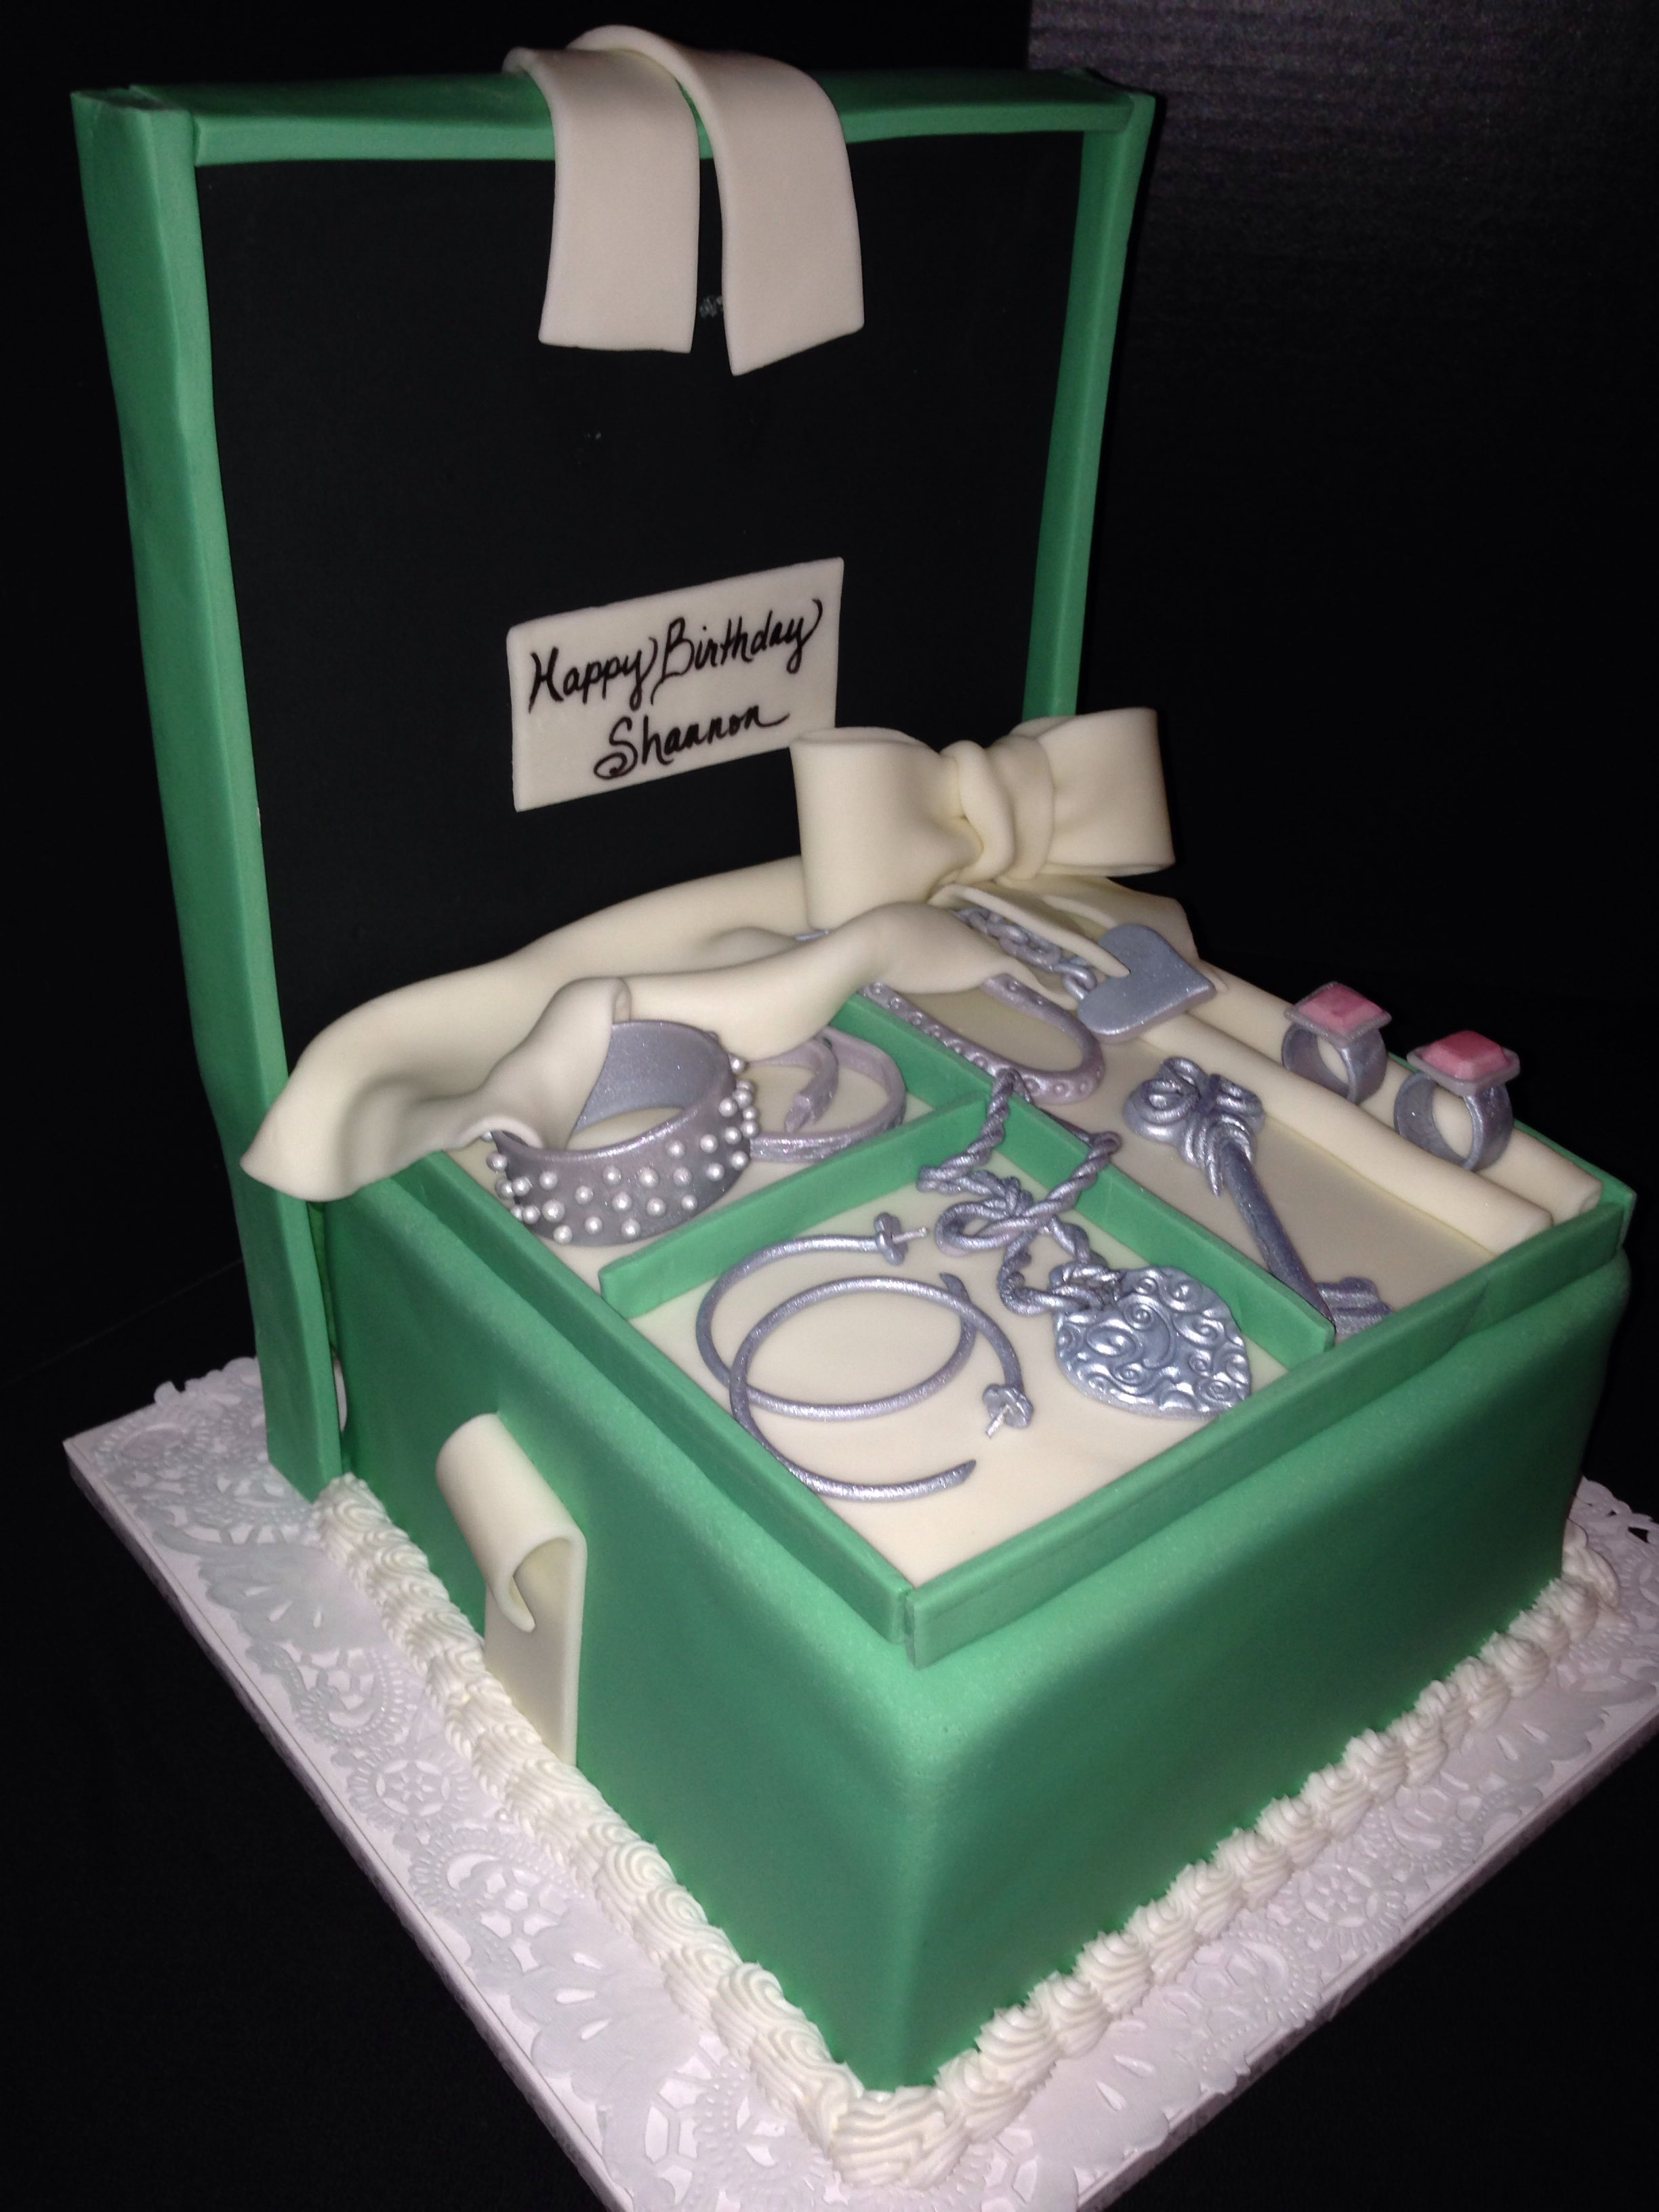 Tiffany jewelry gift box cake My creations Small